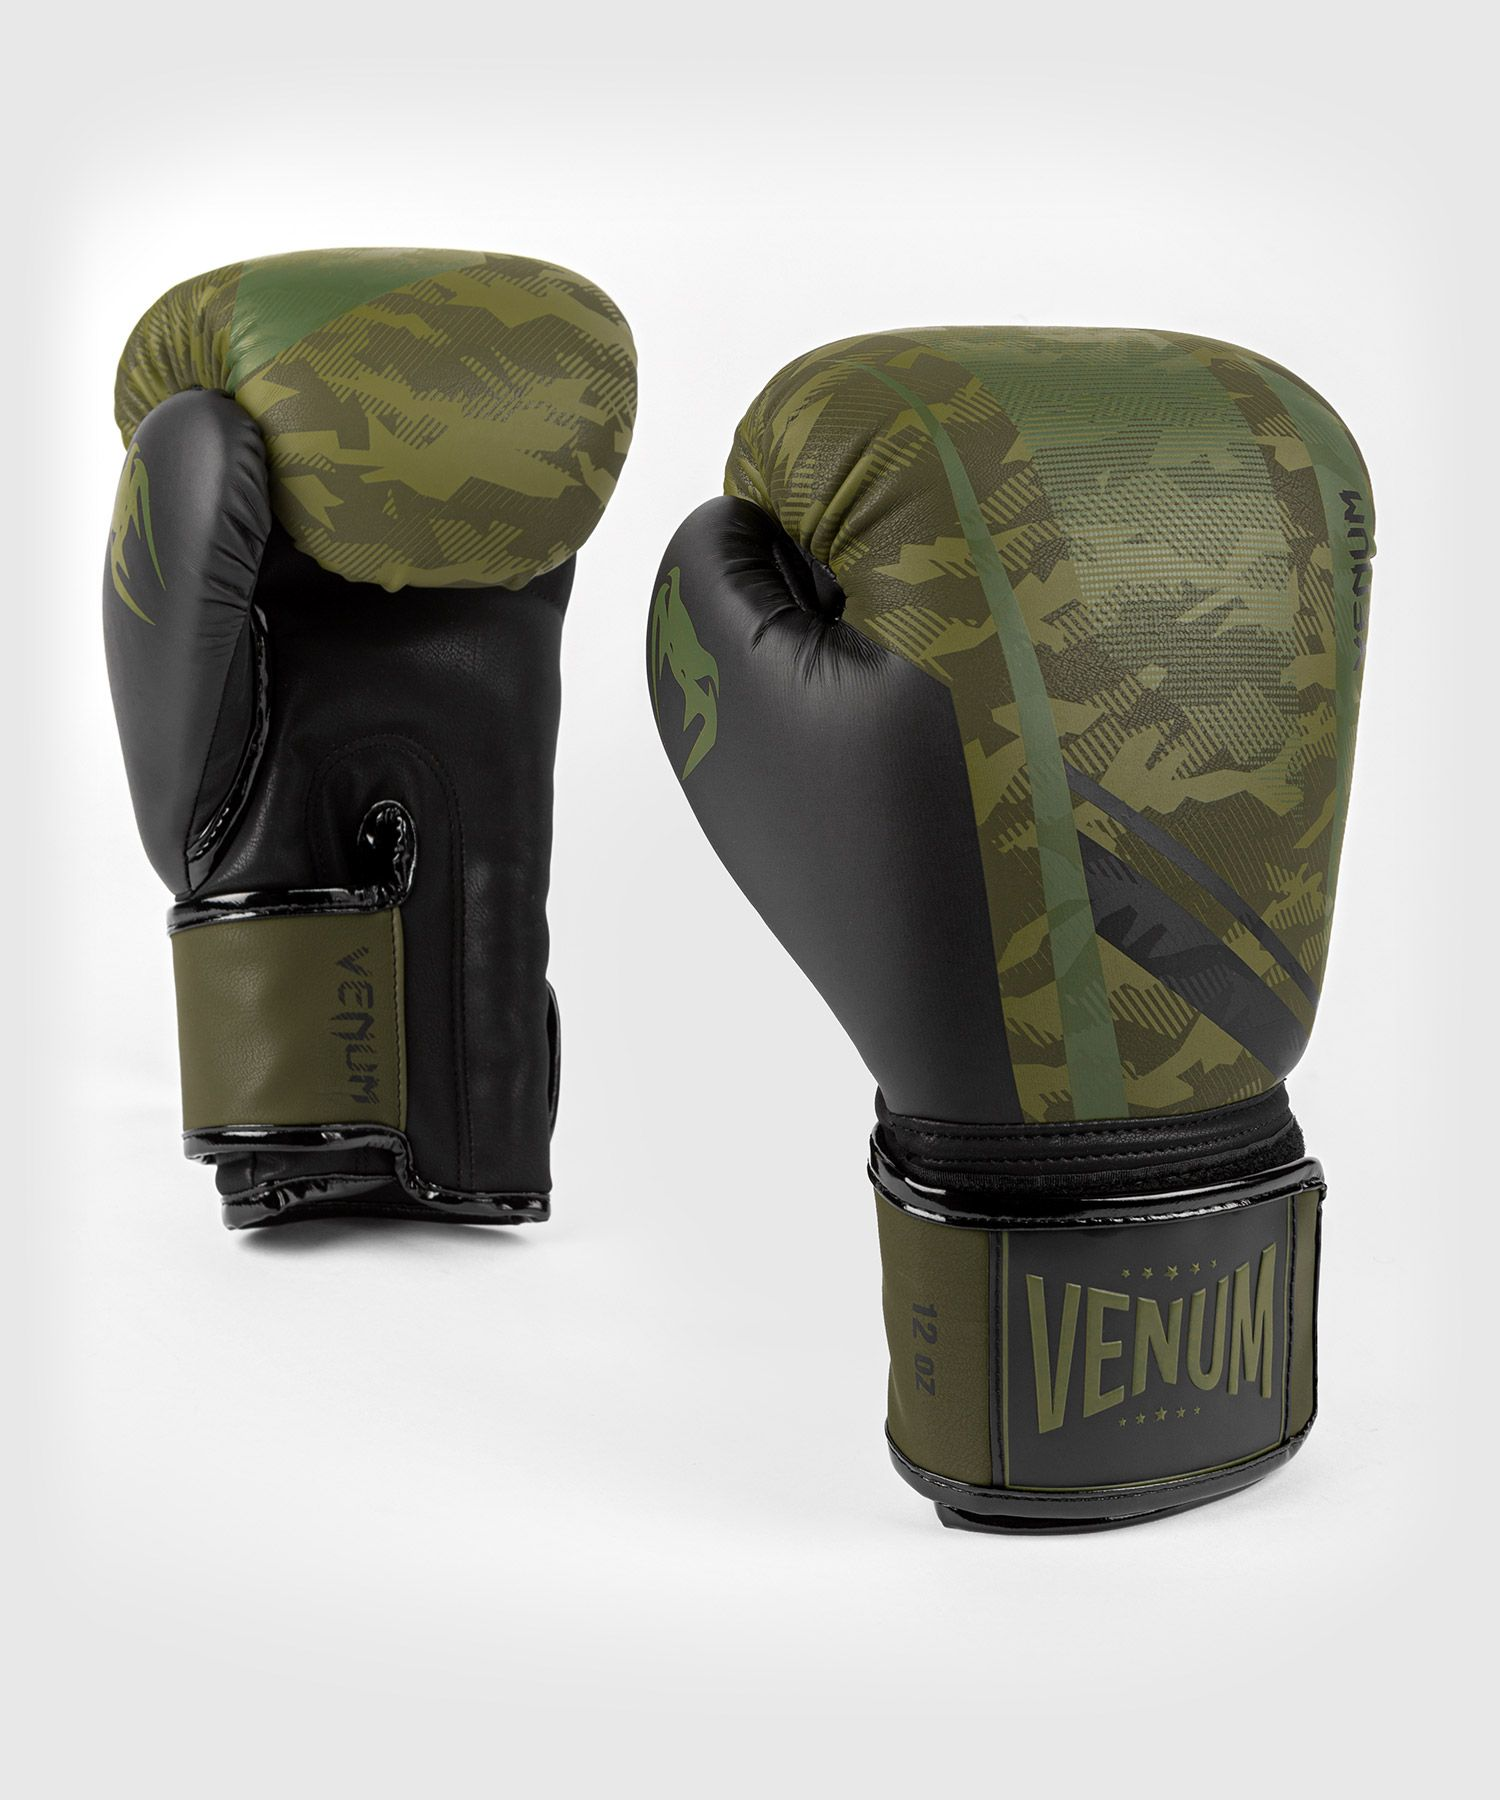 Venum Trooper Boxhandschuhe - Camo Wald/Schwarz